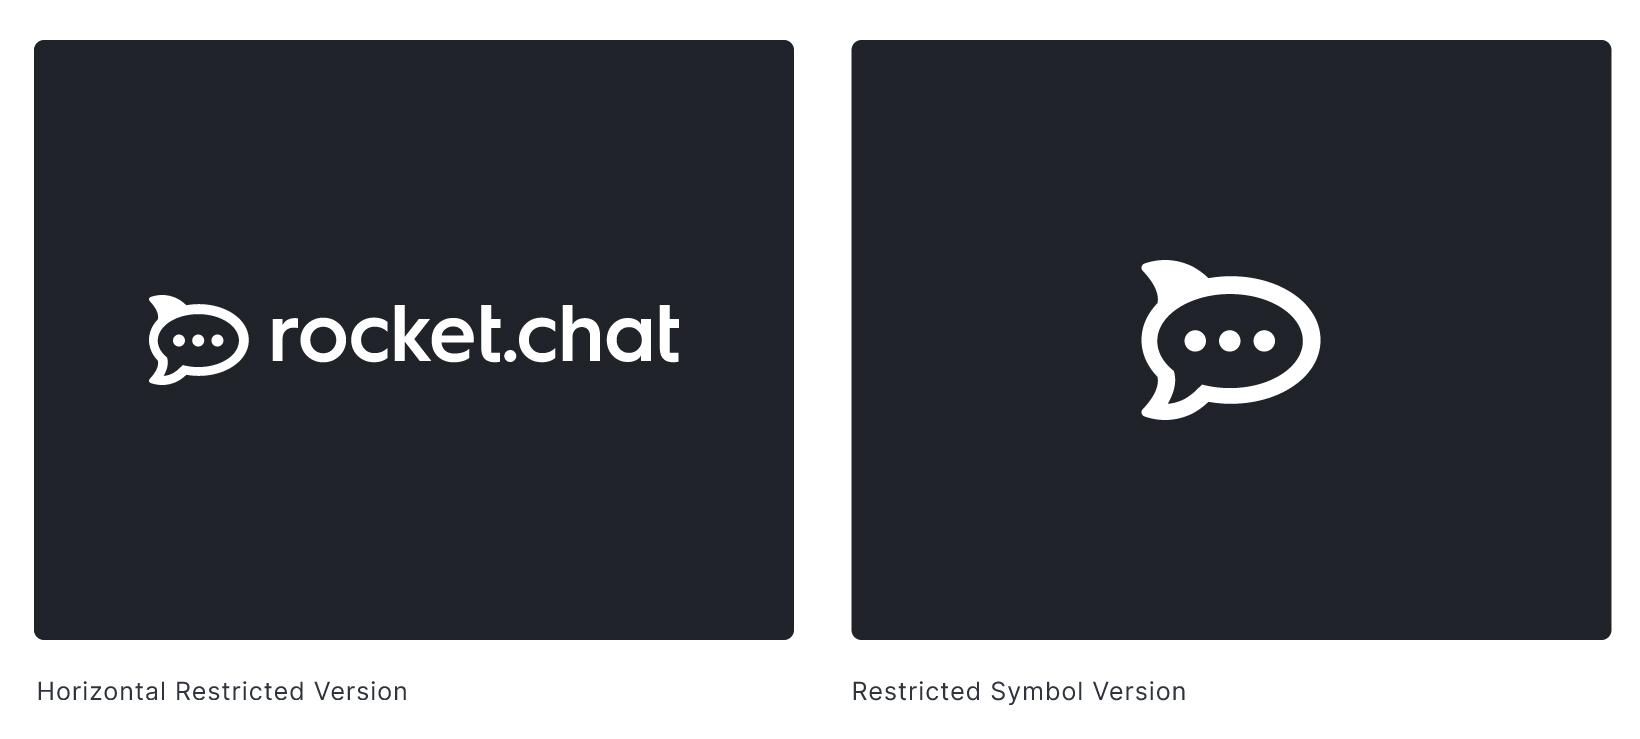 .gitbook/assets/03_logo.jpg